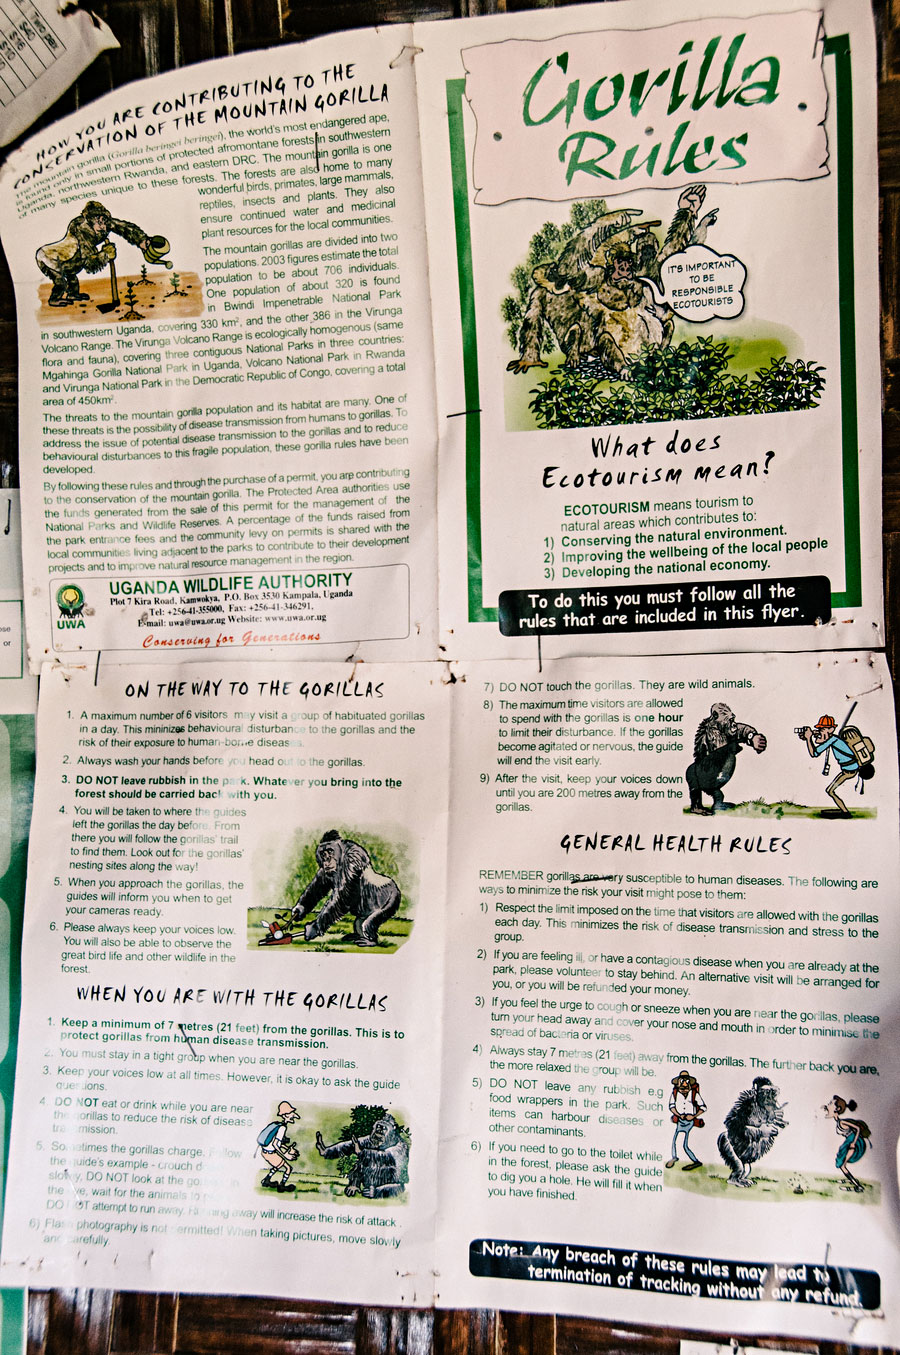 mountain-gorillas-uganda-005.jpg